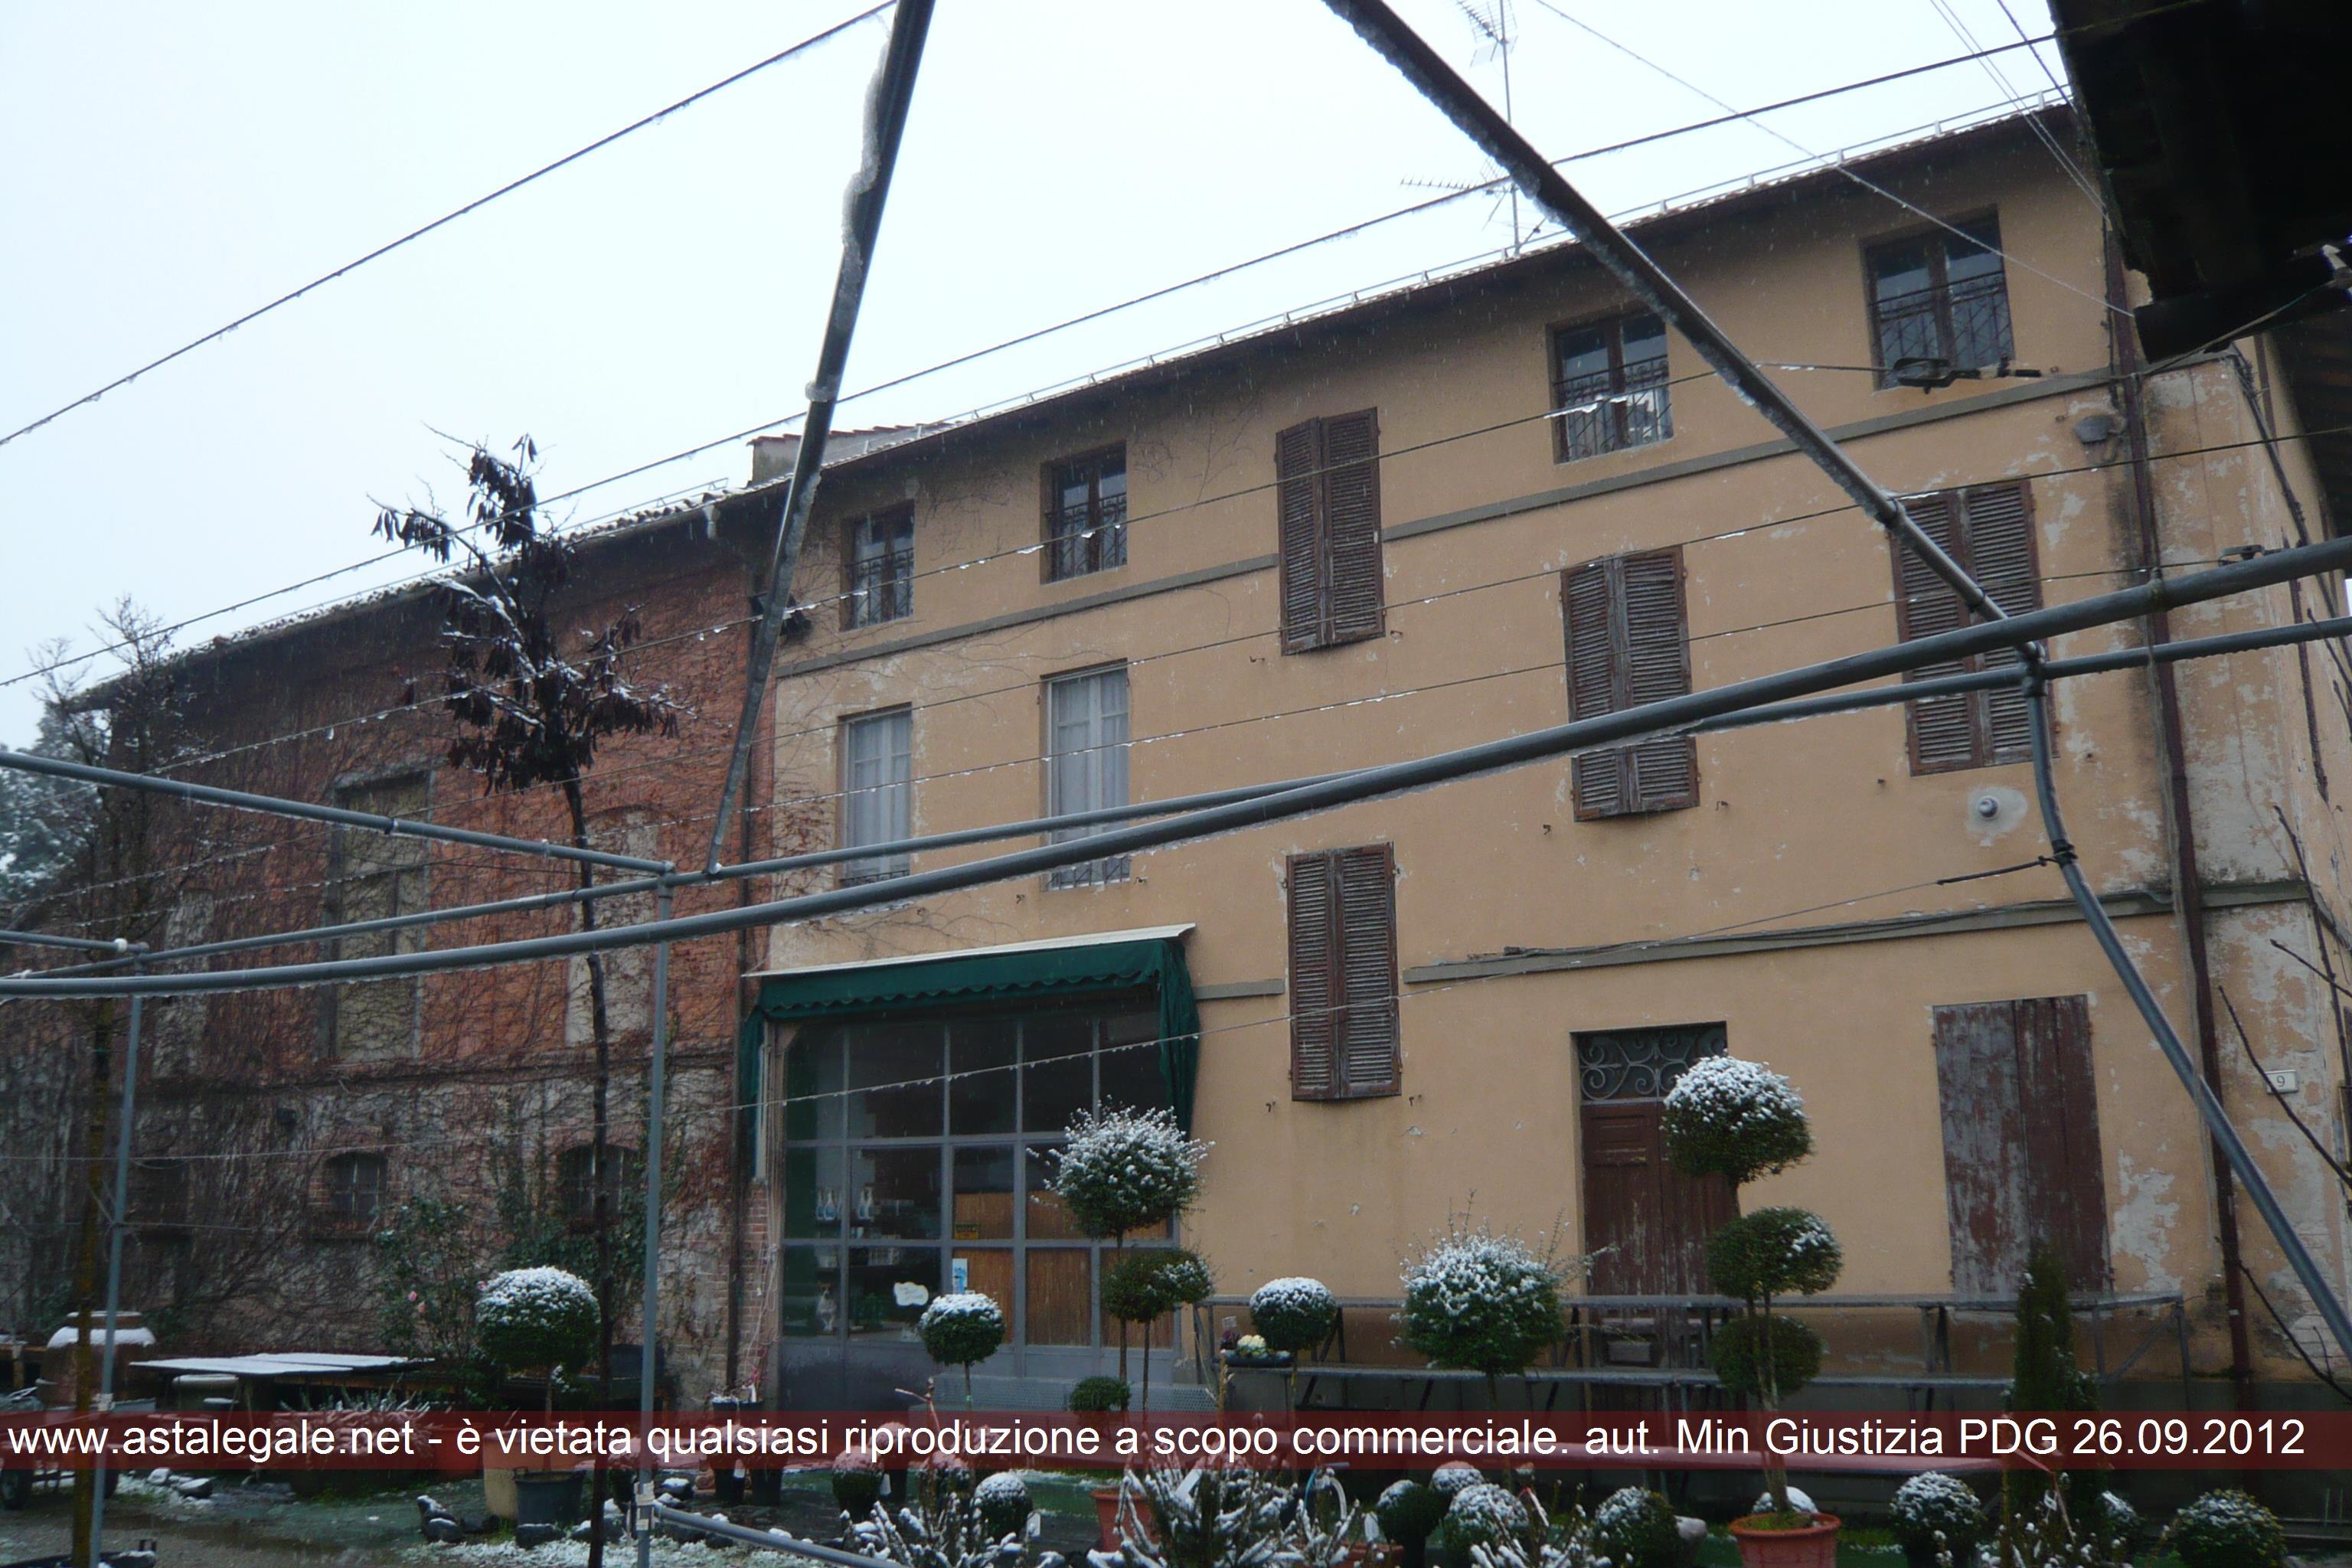 Langhirano (PR) Frazione Pilastro, Via Pedemontana 9 e 11